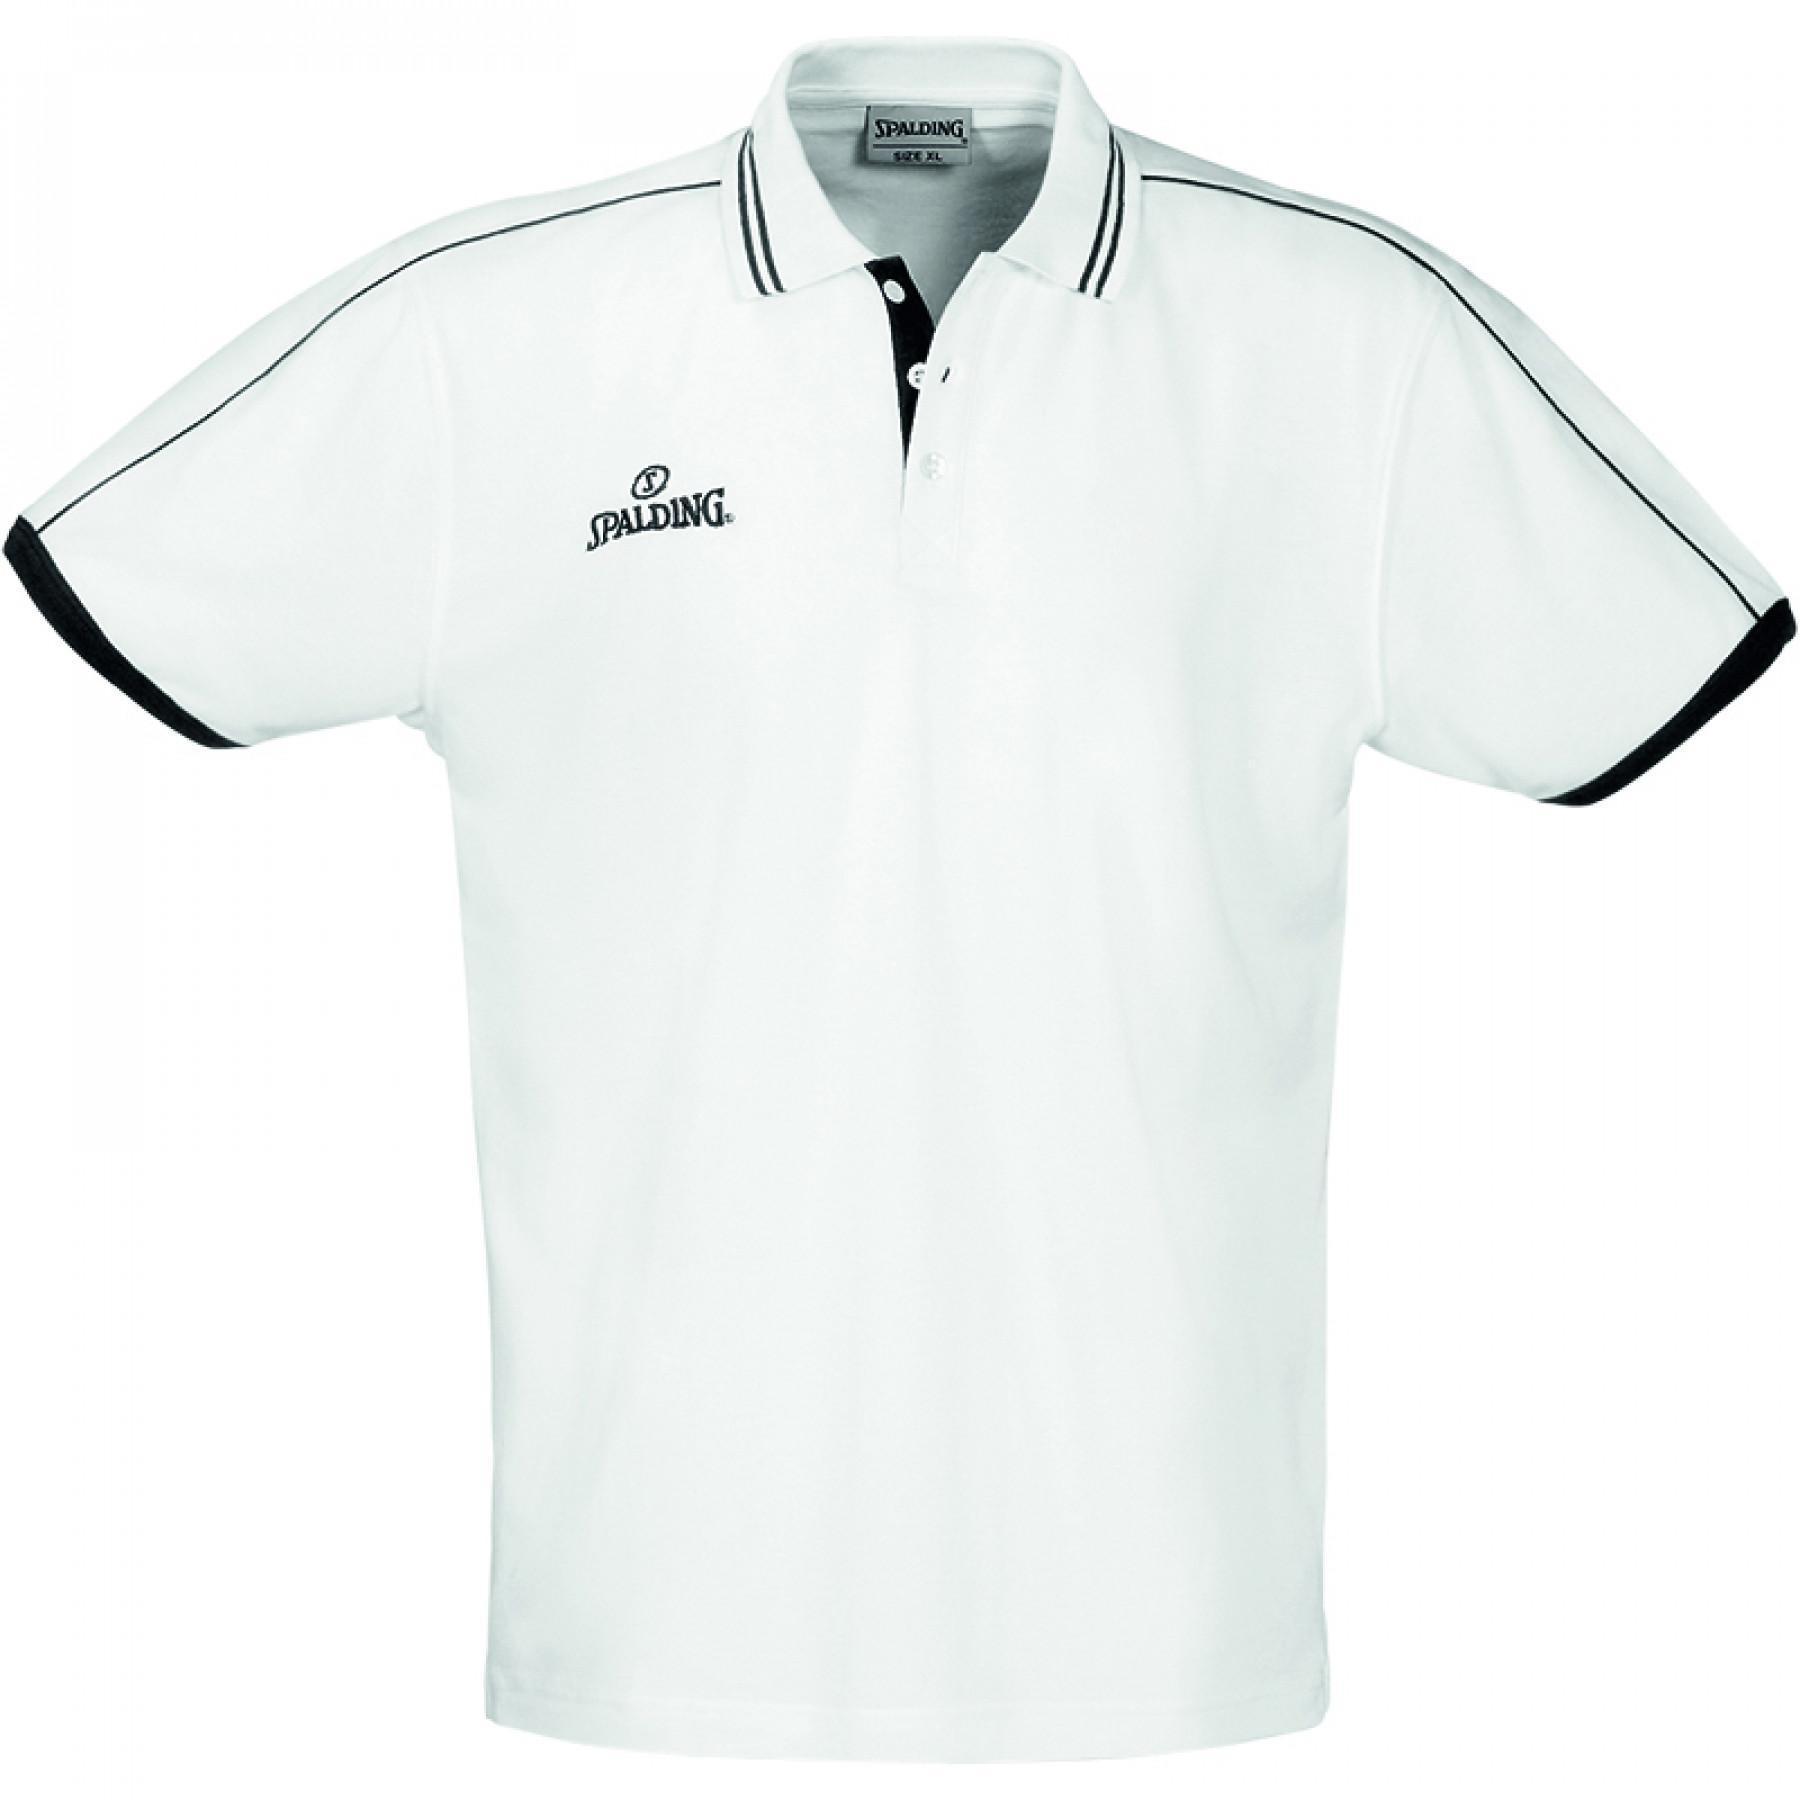 Spalding polo shirt short sleeves